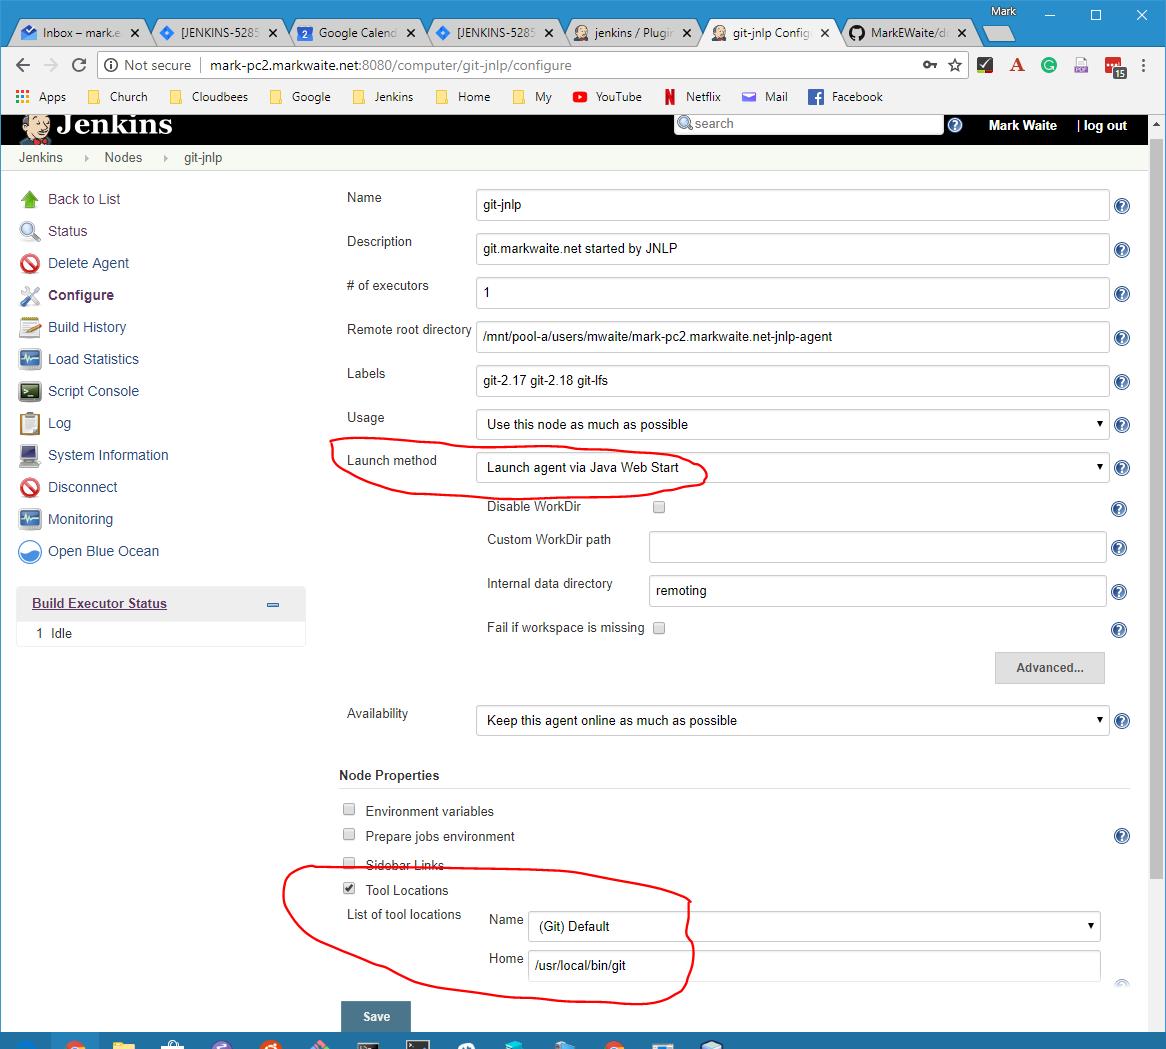 JENKINS-52857] Cannot find git-lfs when it is not installed